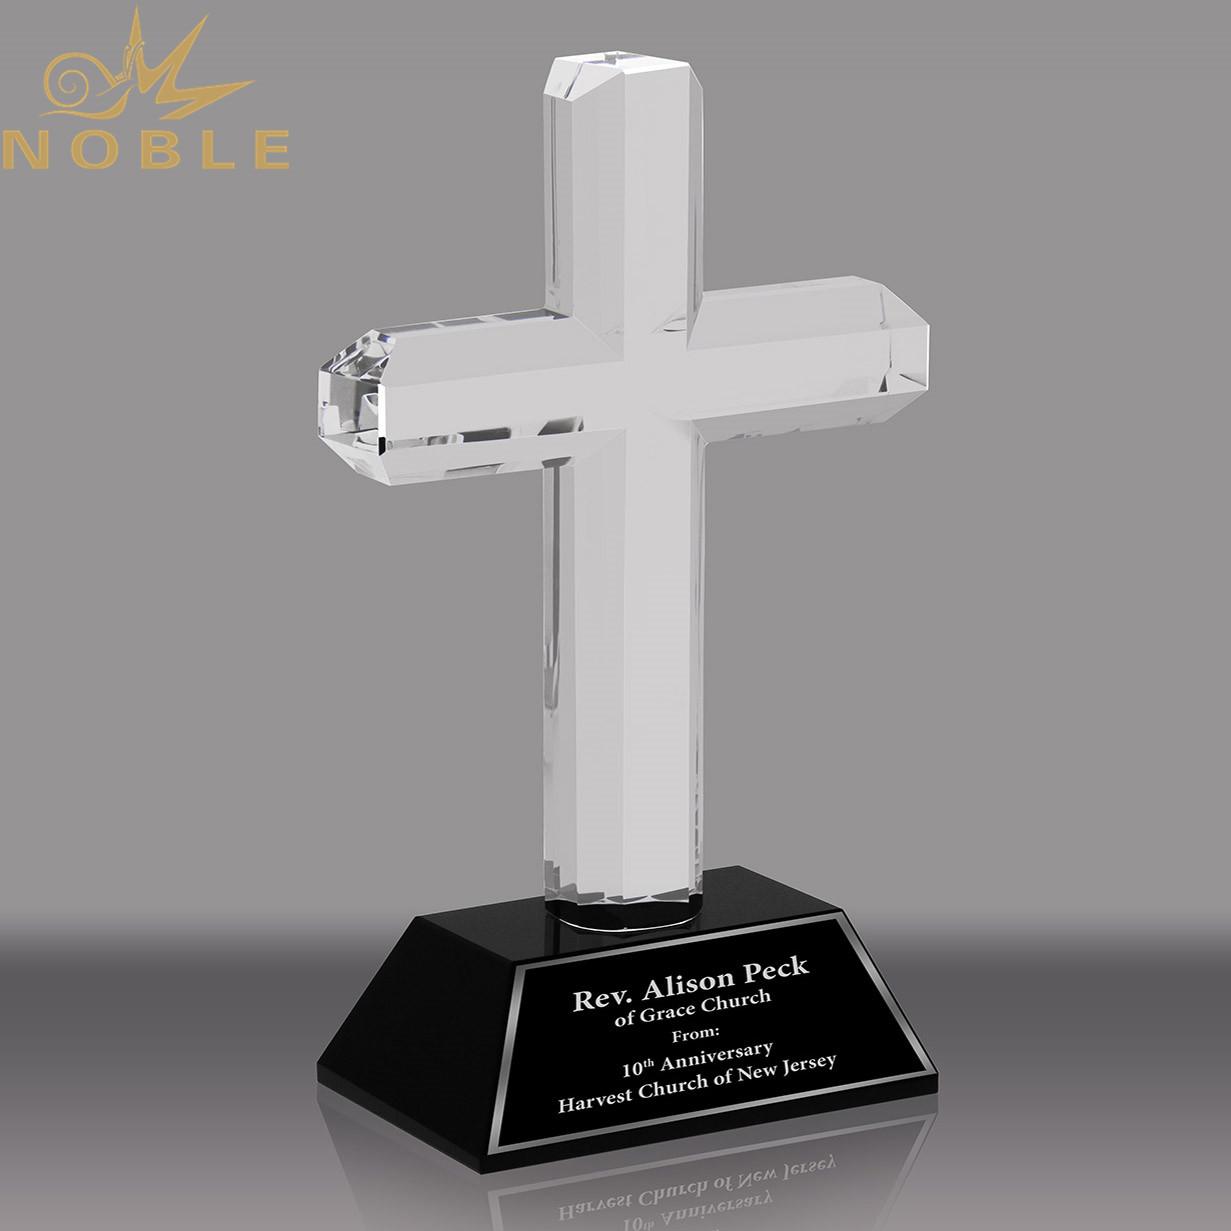 Noble Custom Crystal Cross Award with Black Crystal Base